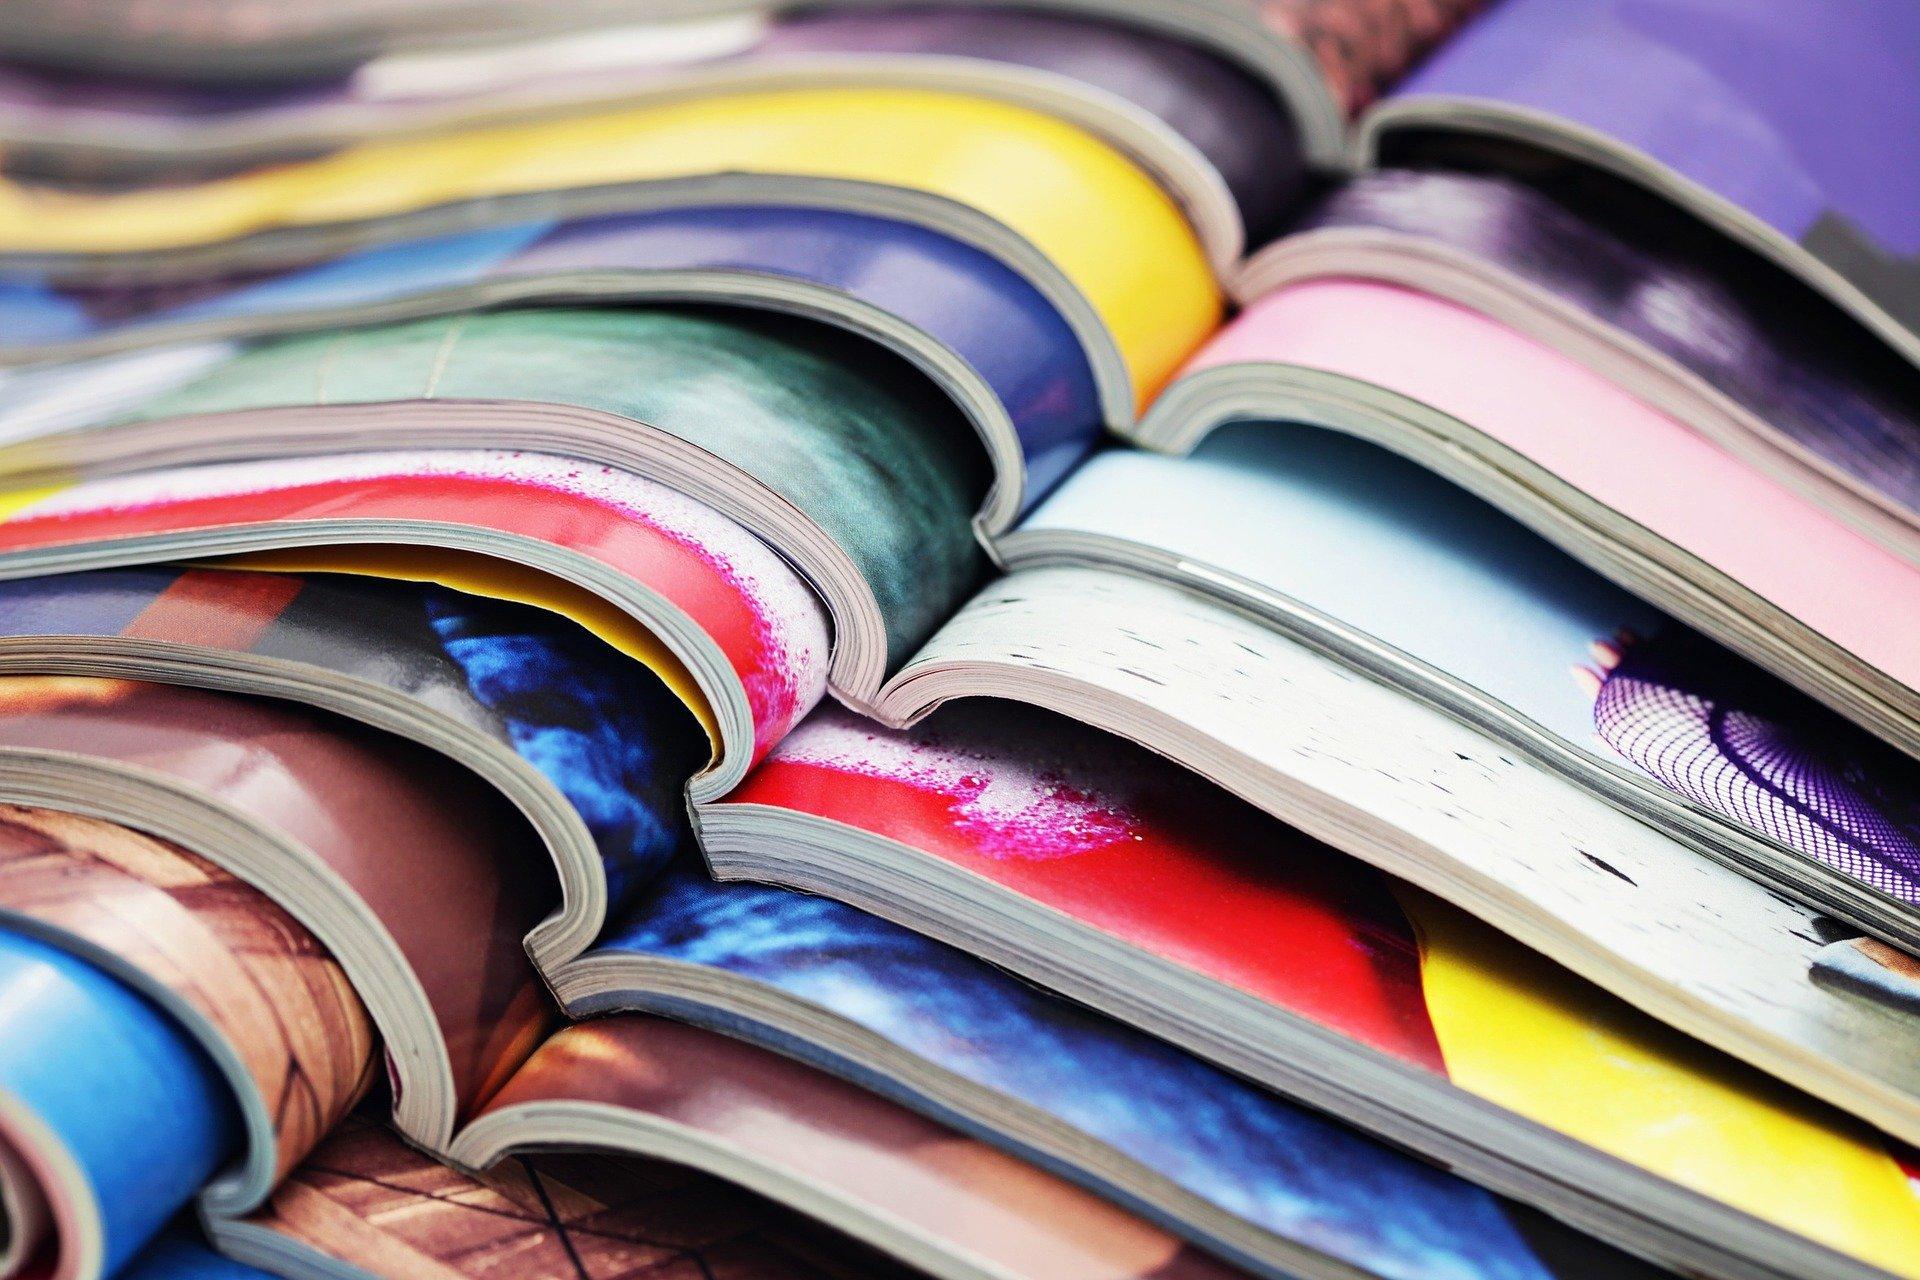 IBMや資生堂の事例で知る!紙媒体をオウンドメディアへ移行するコツ